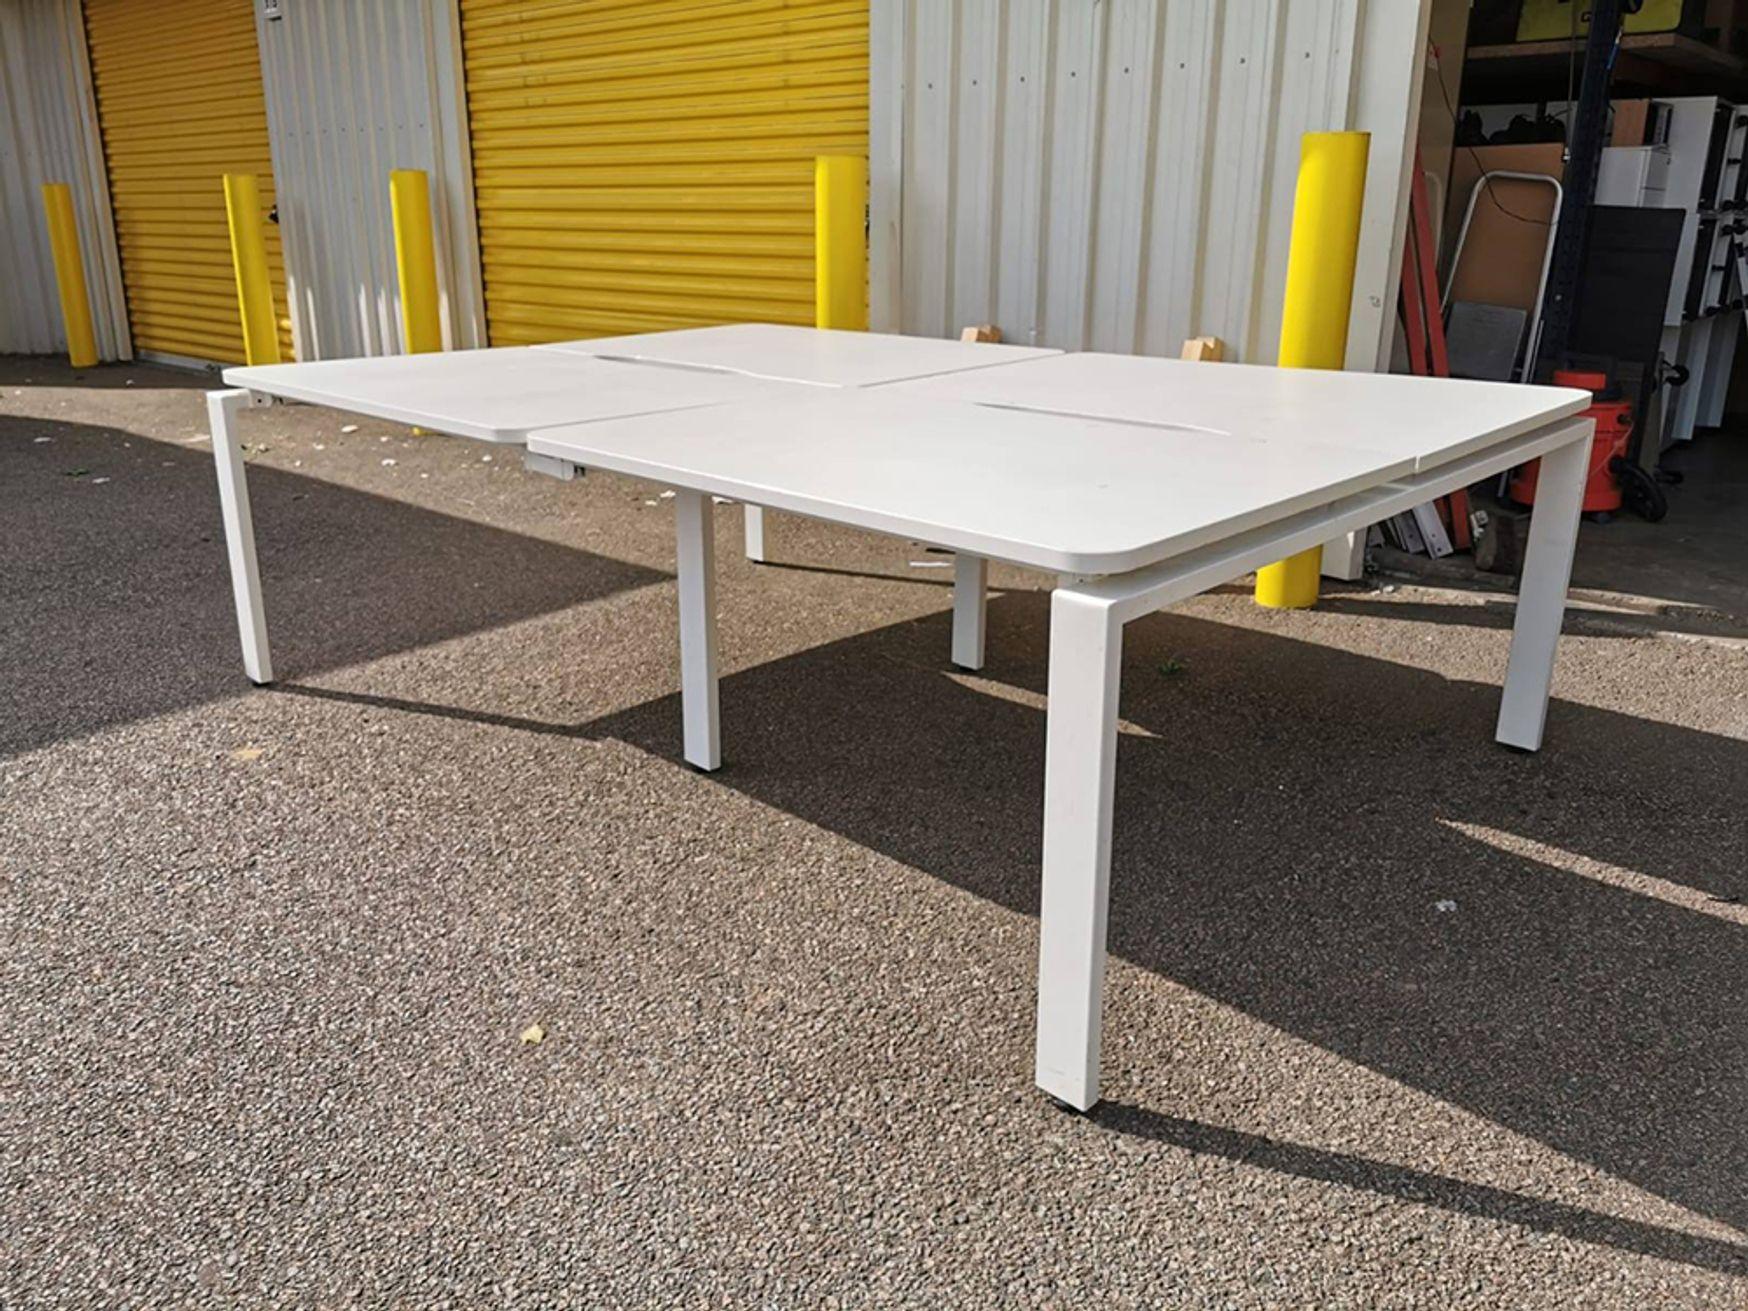 Used 1200mm Lee & Plumpton White Bench Desks